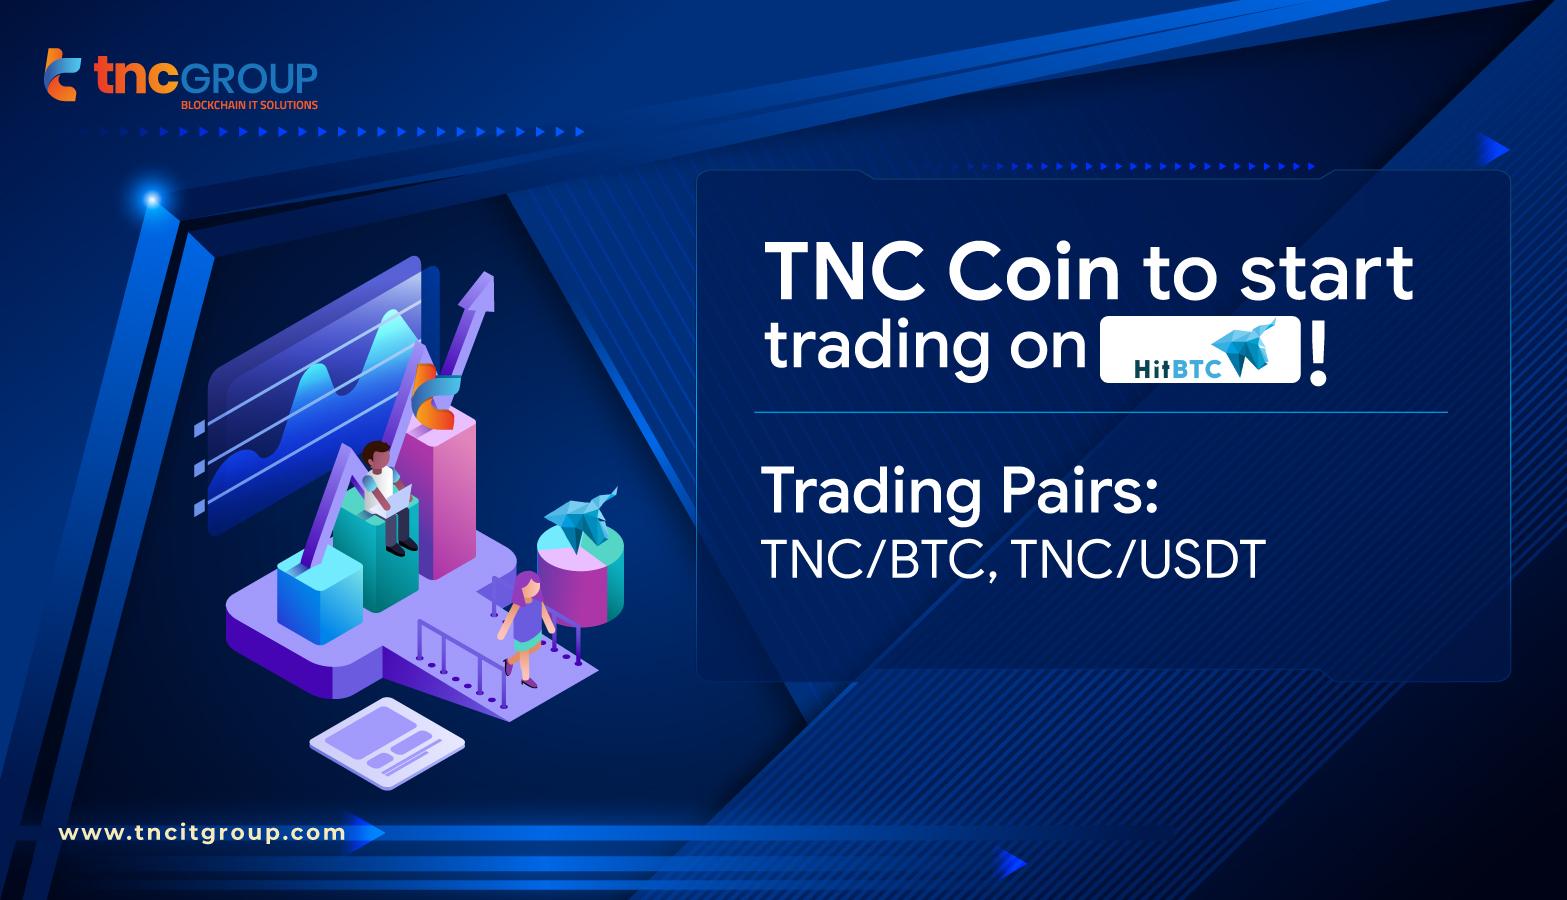 TNC Coin now accepted on Hitbtc